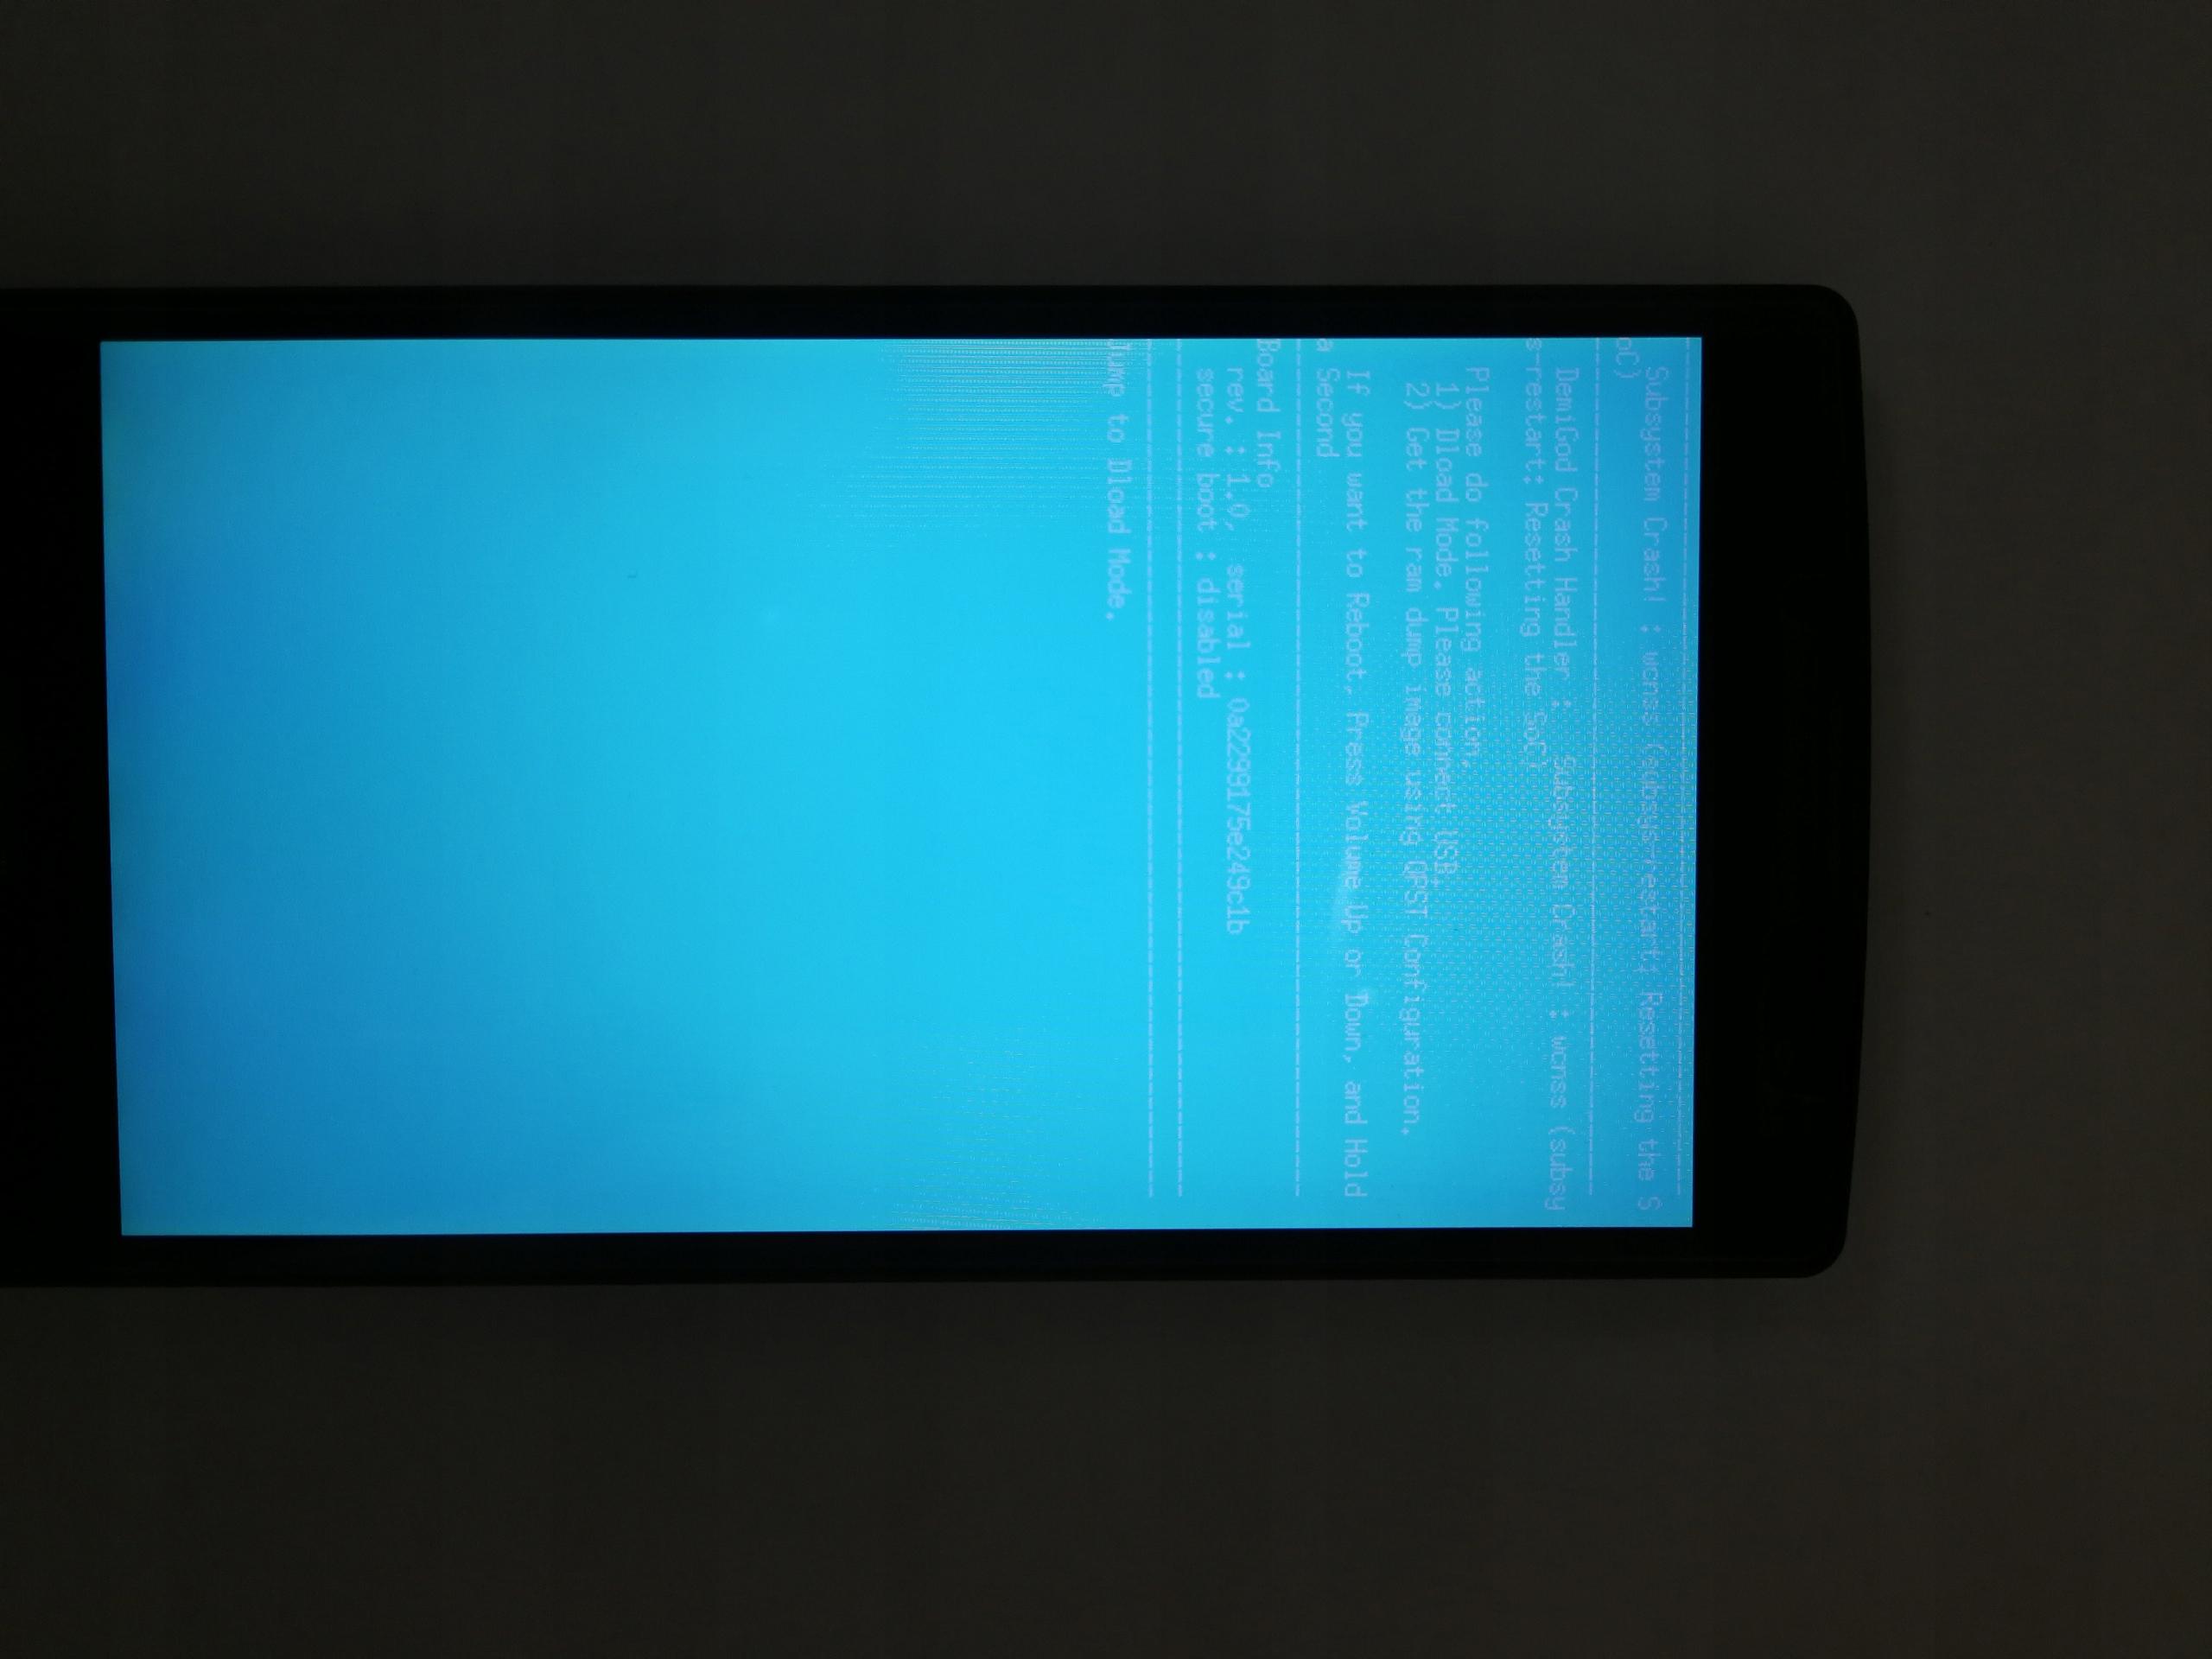 LG Spirit 440H 4G LTE - 7672134643 - oficjalne archiwum allegro